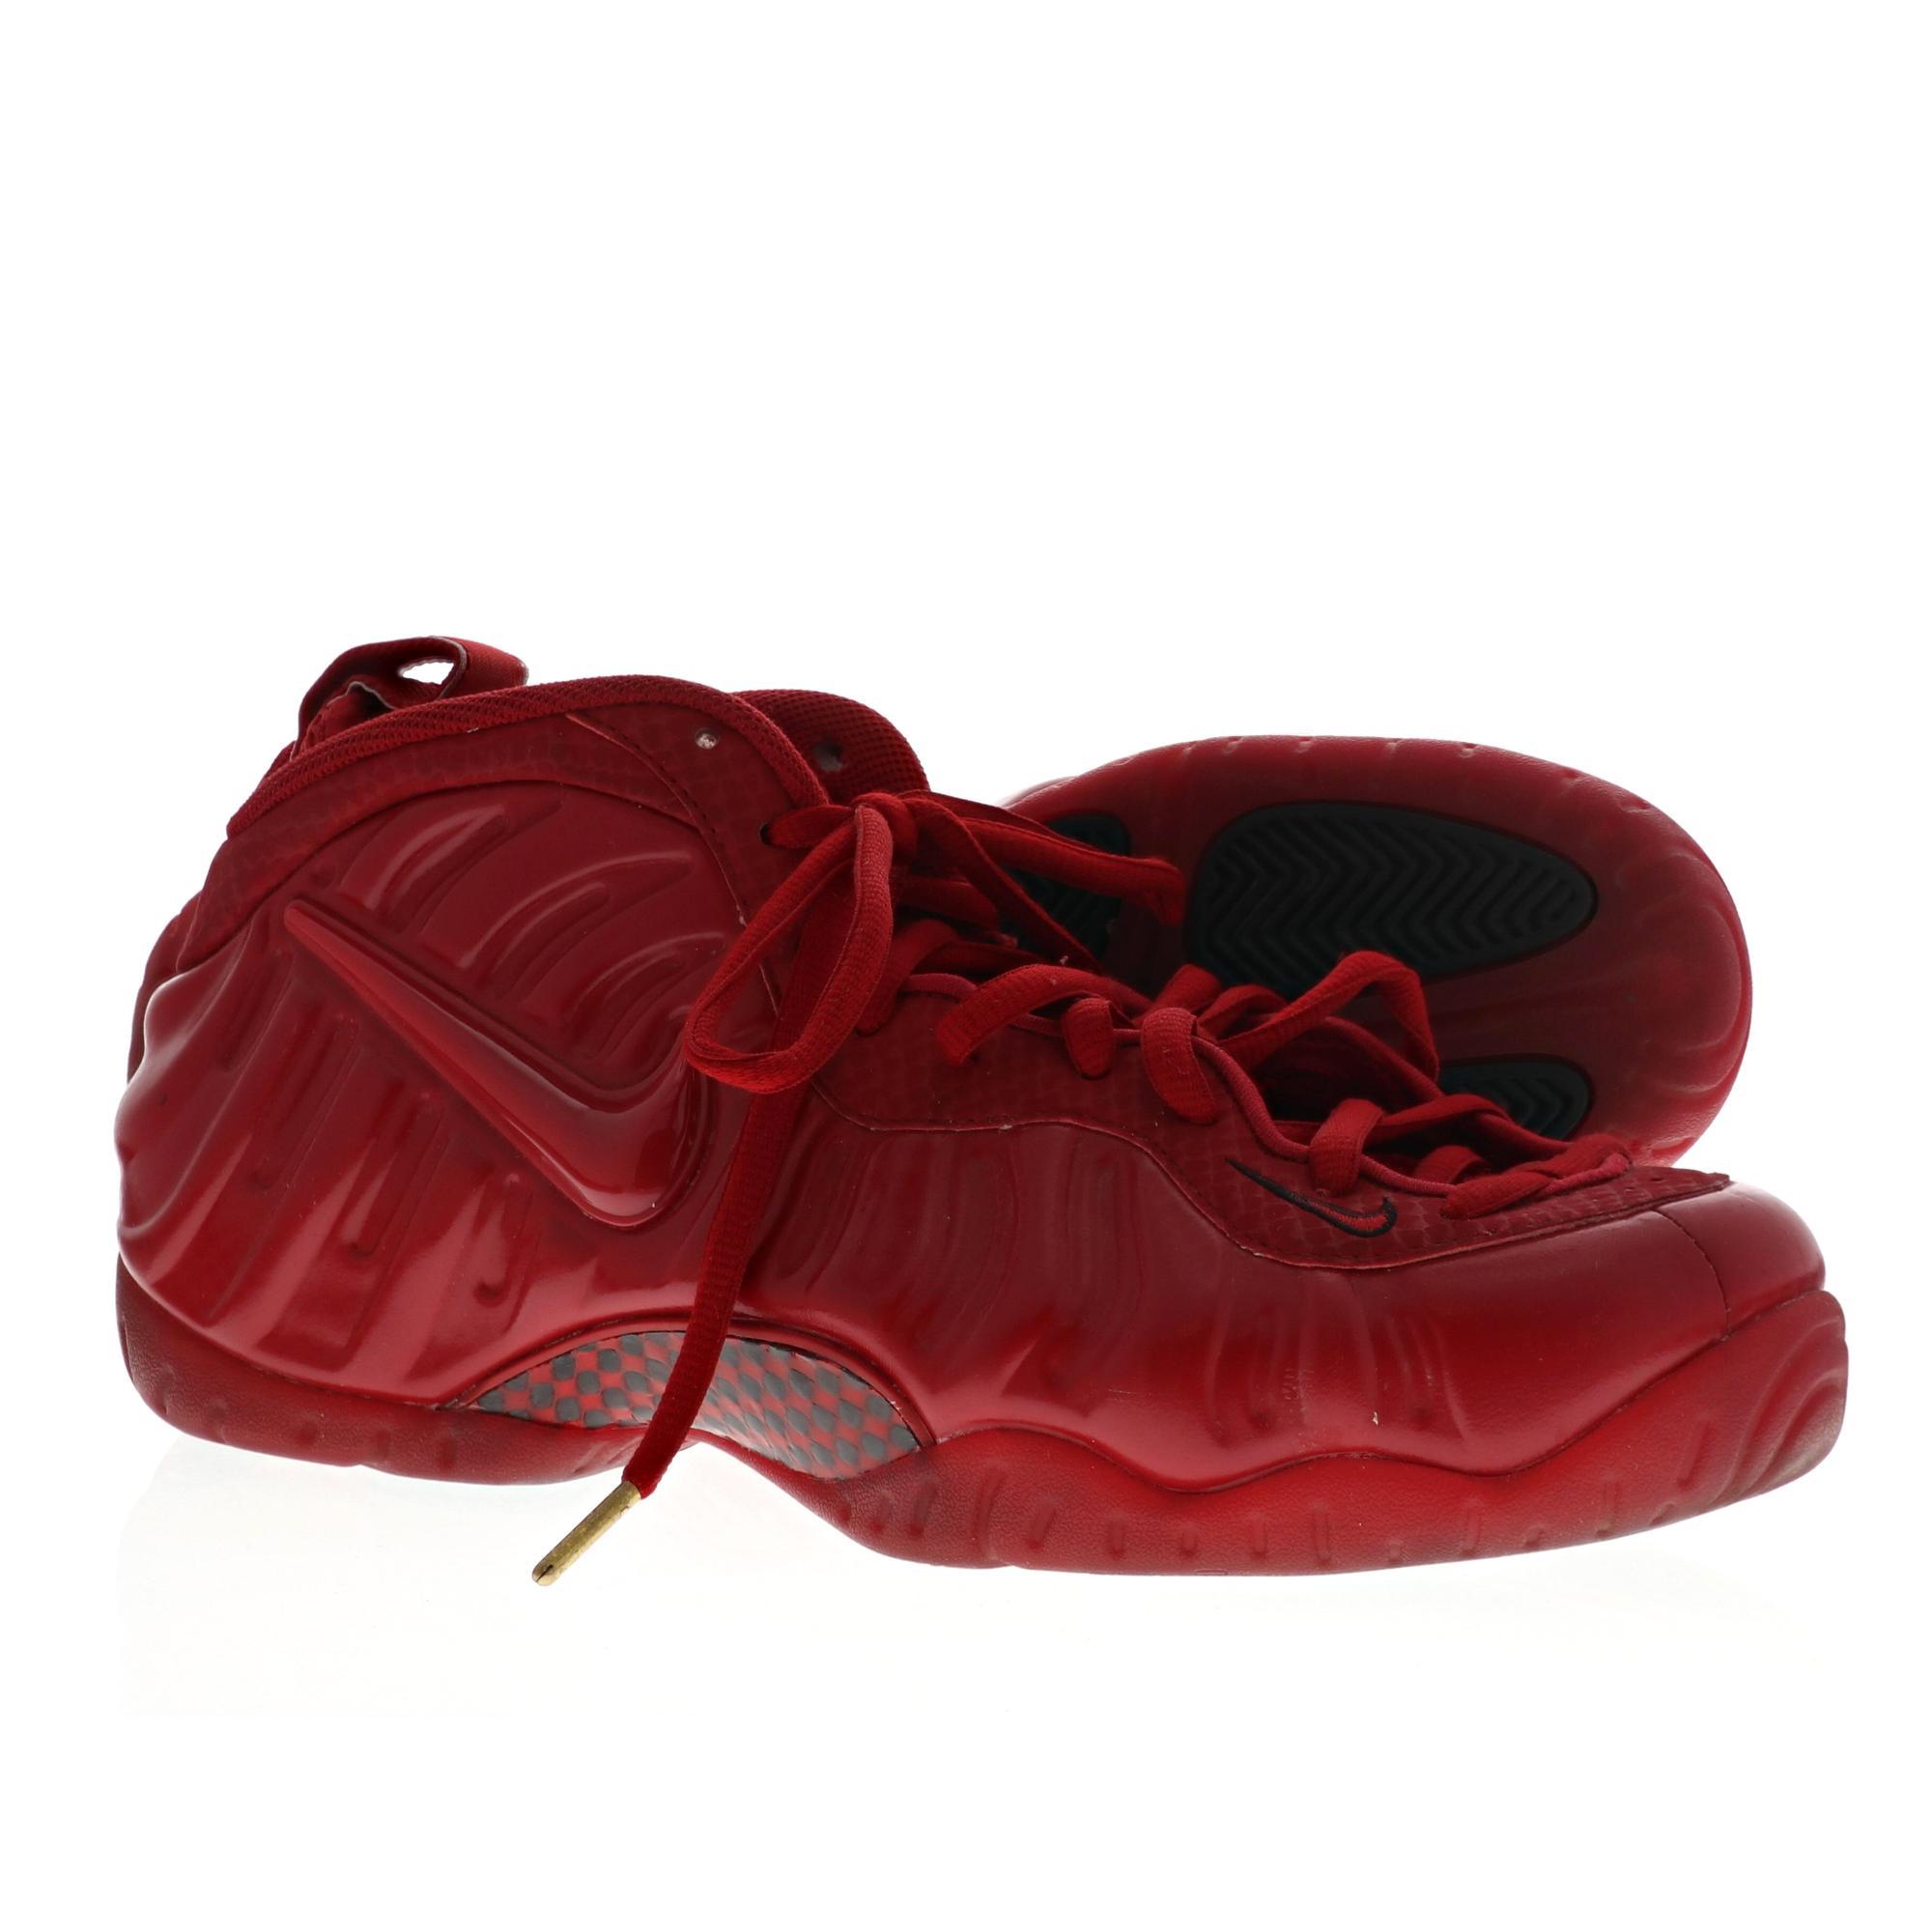 meet 31a74 3ef83 4 25 19 ~ U.S. Marshals Service National Online Auction (Shoes ...